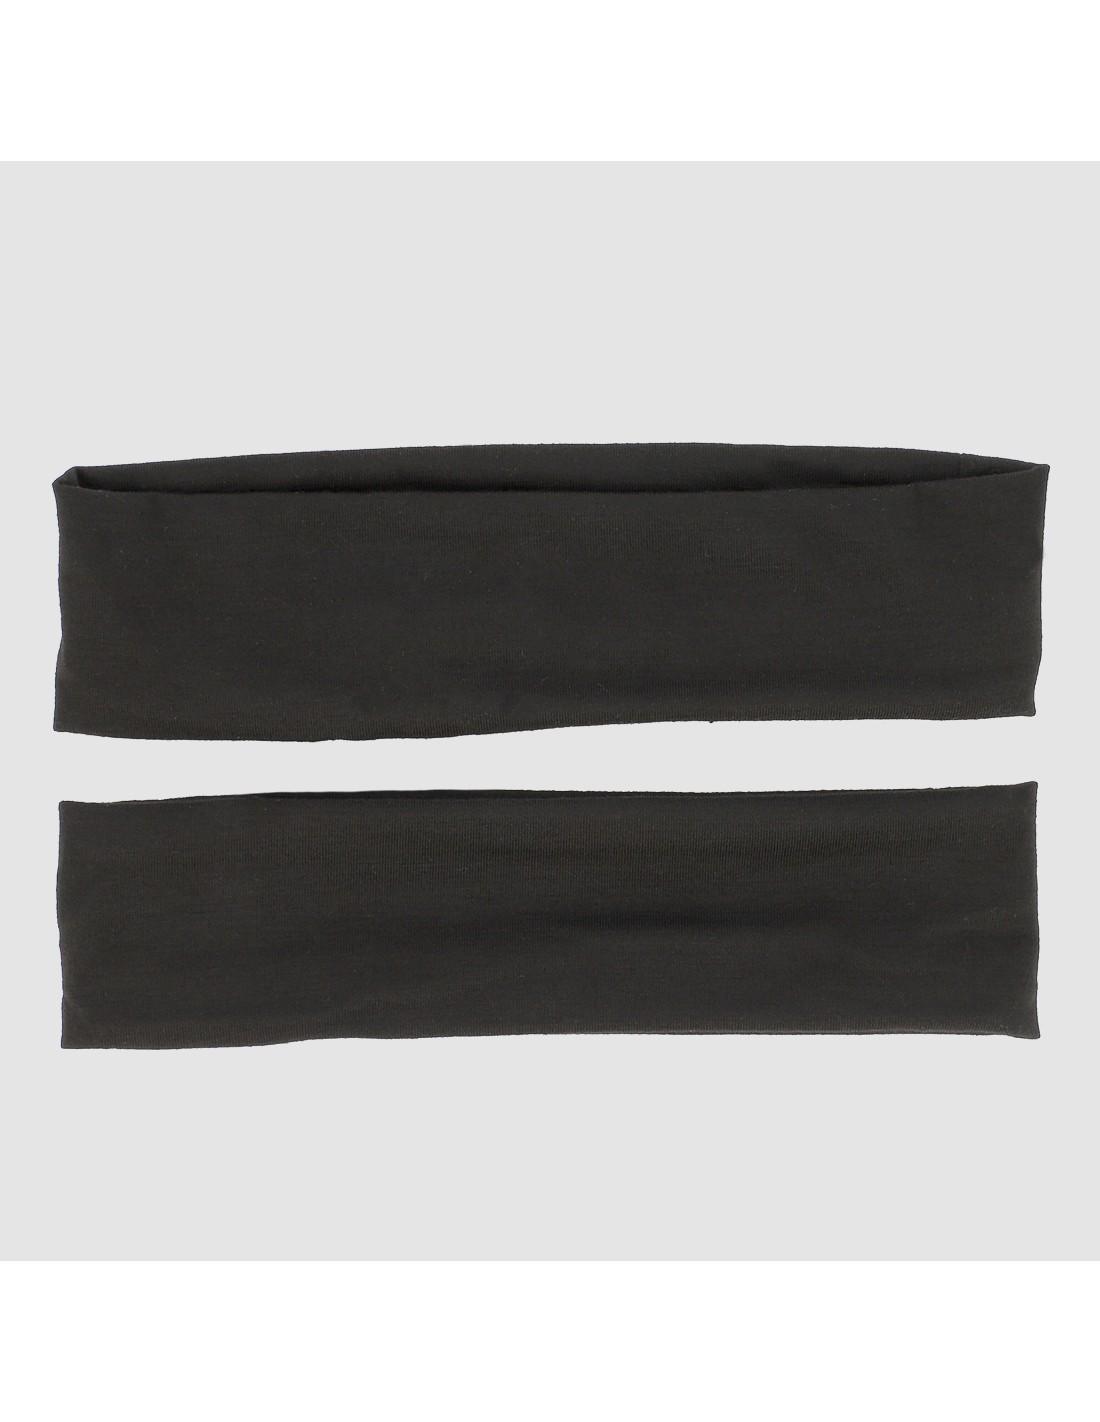 brosse bois brushing ceramique moyen diametre glamour paris. Black Bedroom Furniture Sets. Home Design Ideas